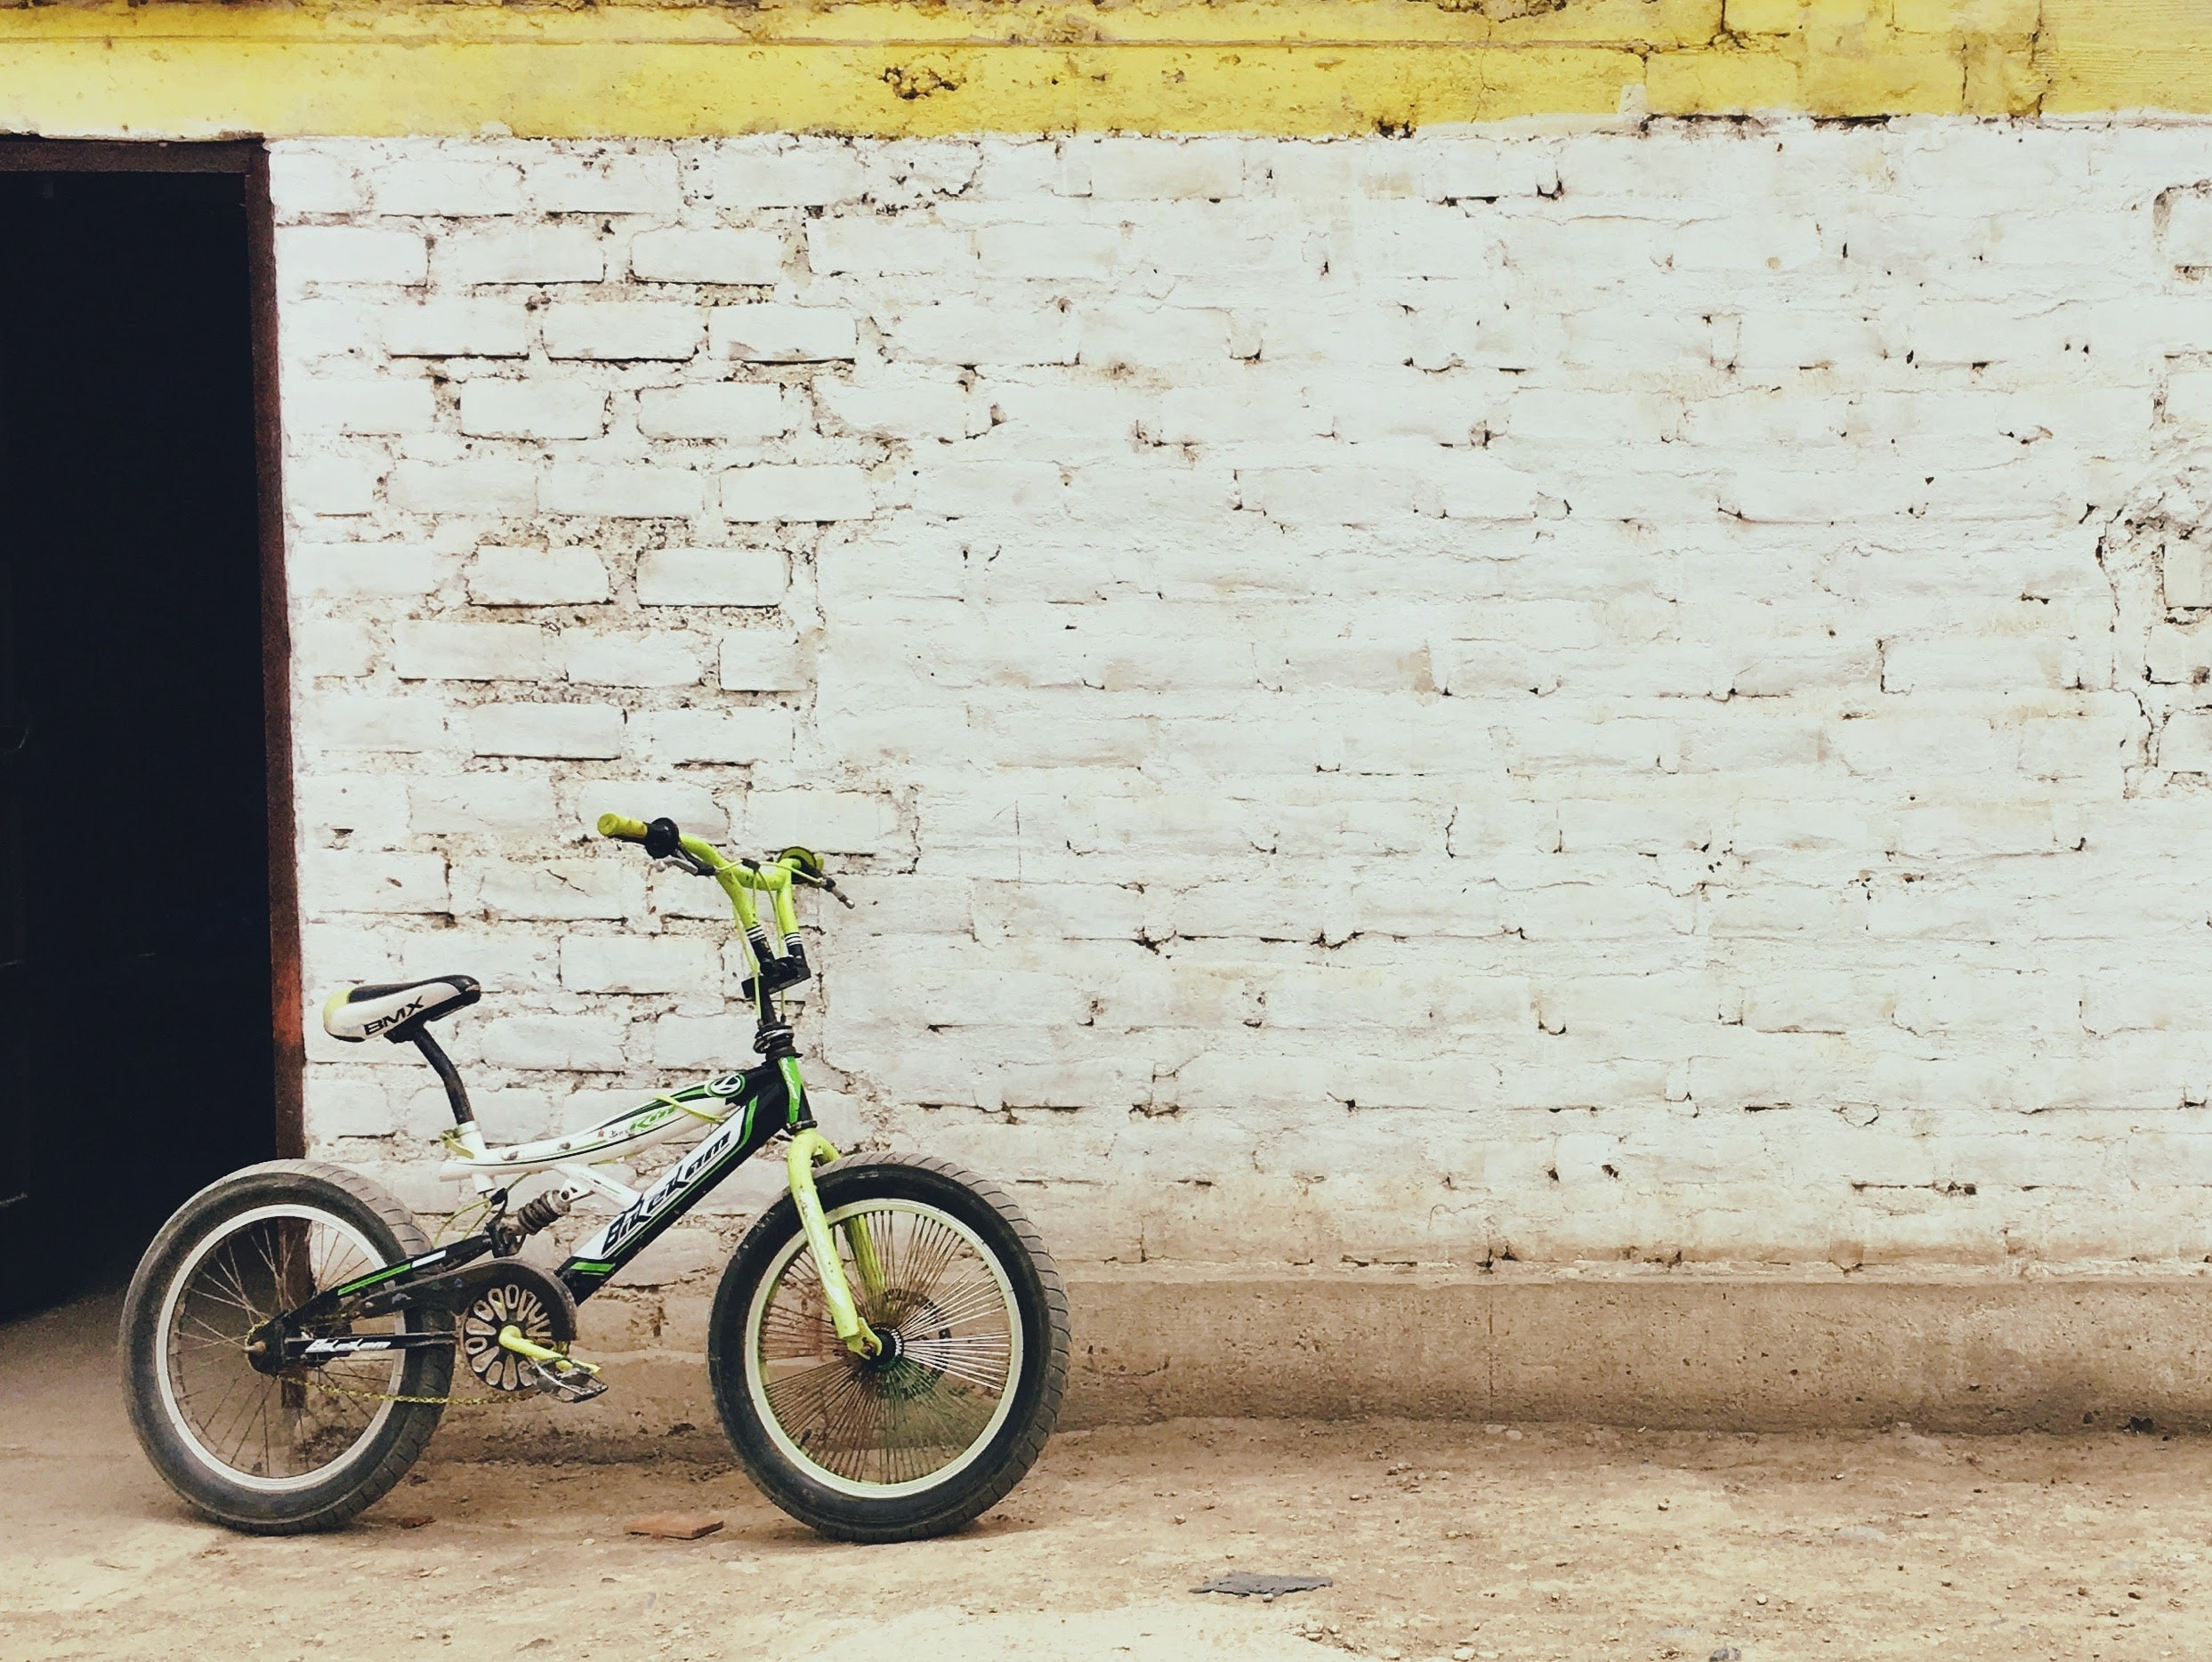 black and green full-suspension bike